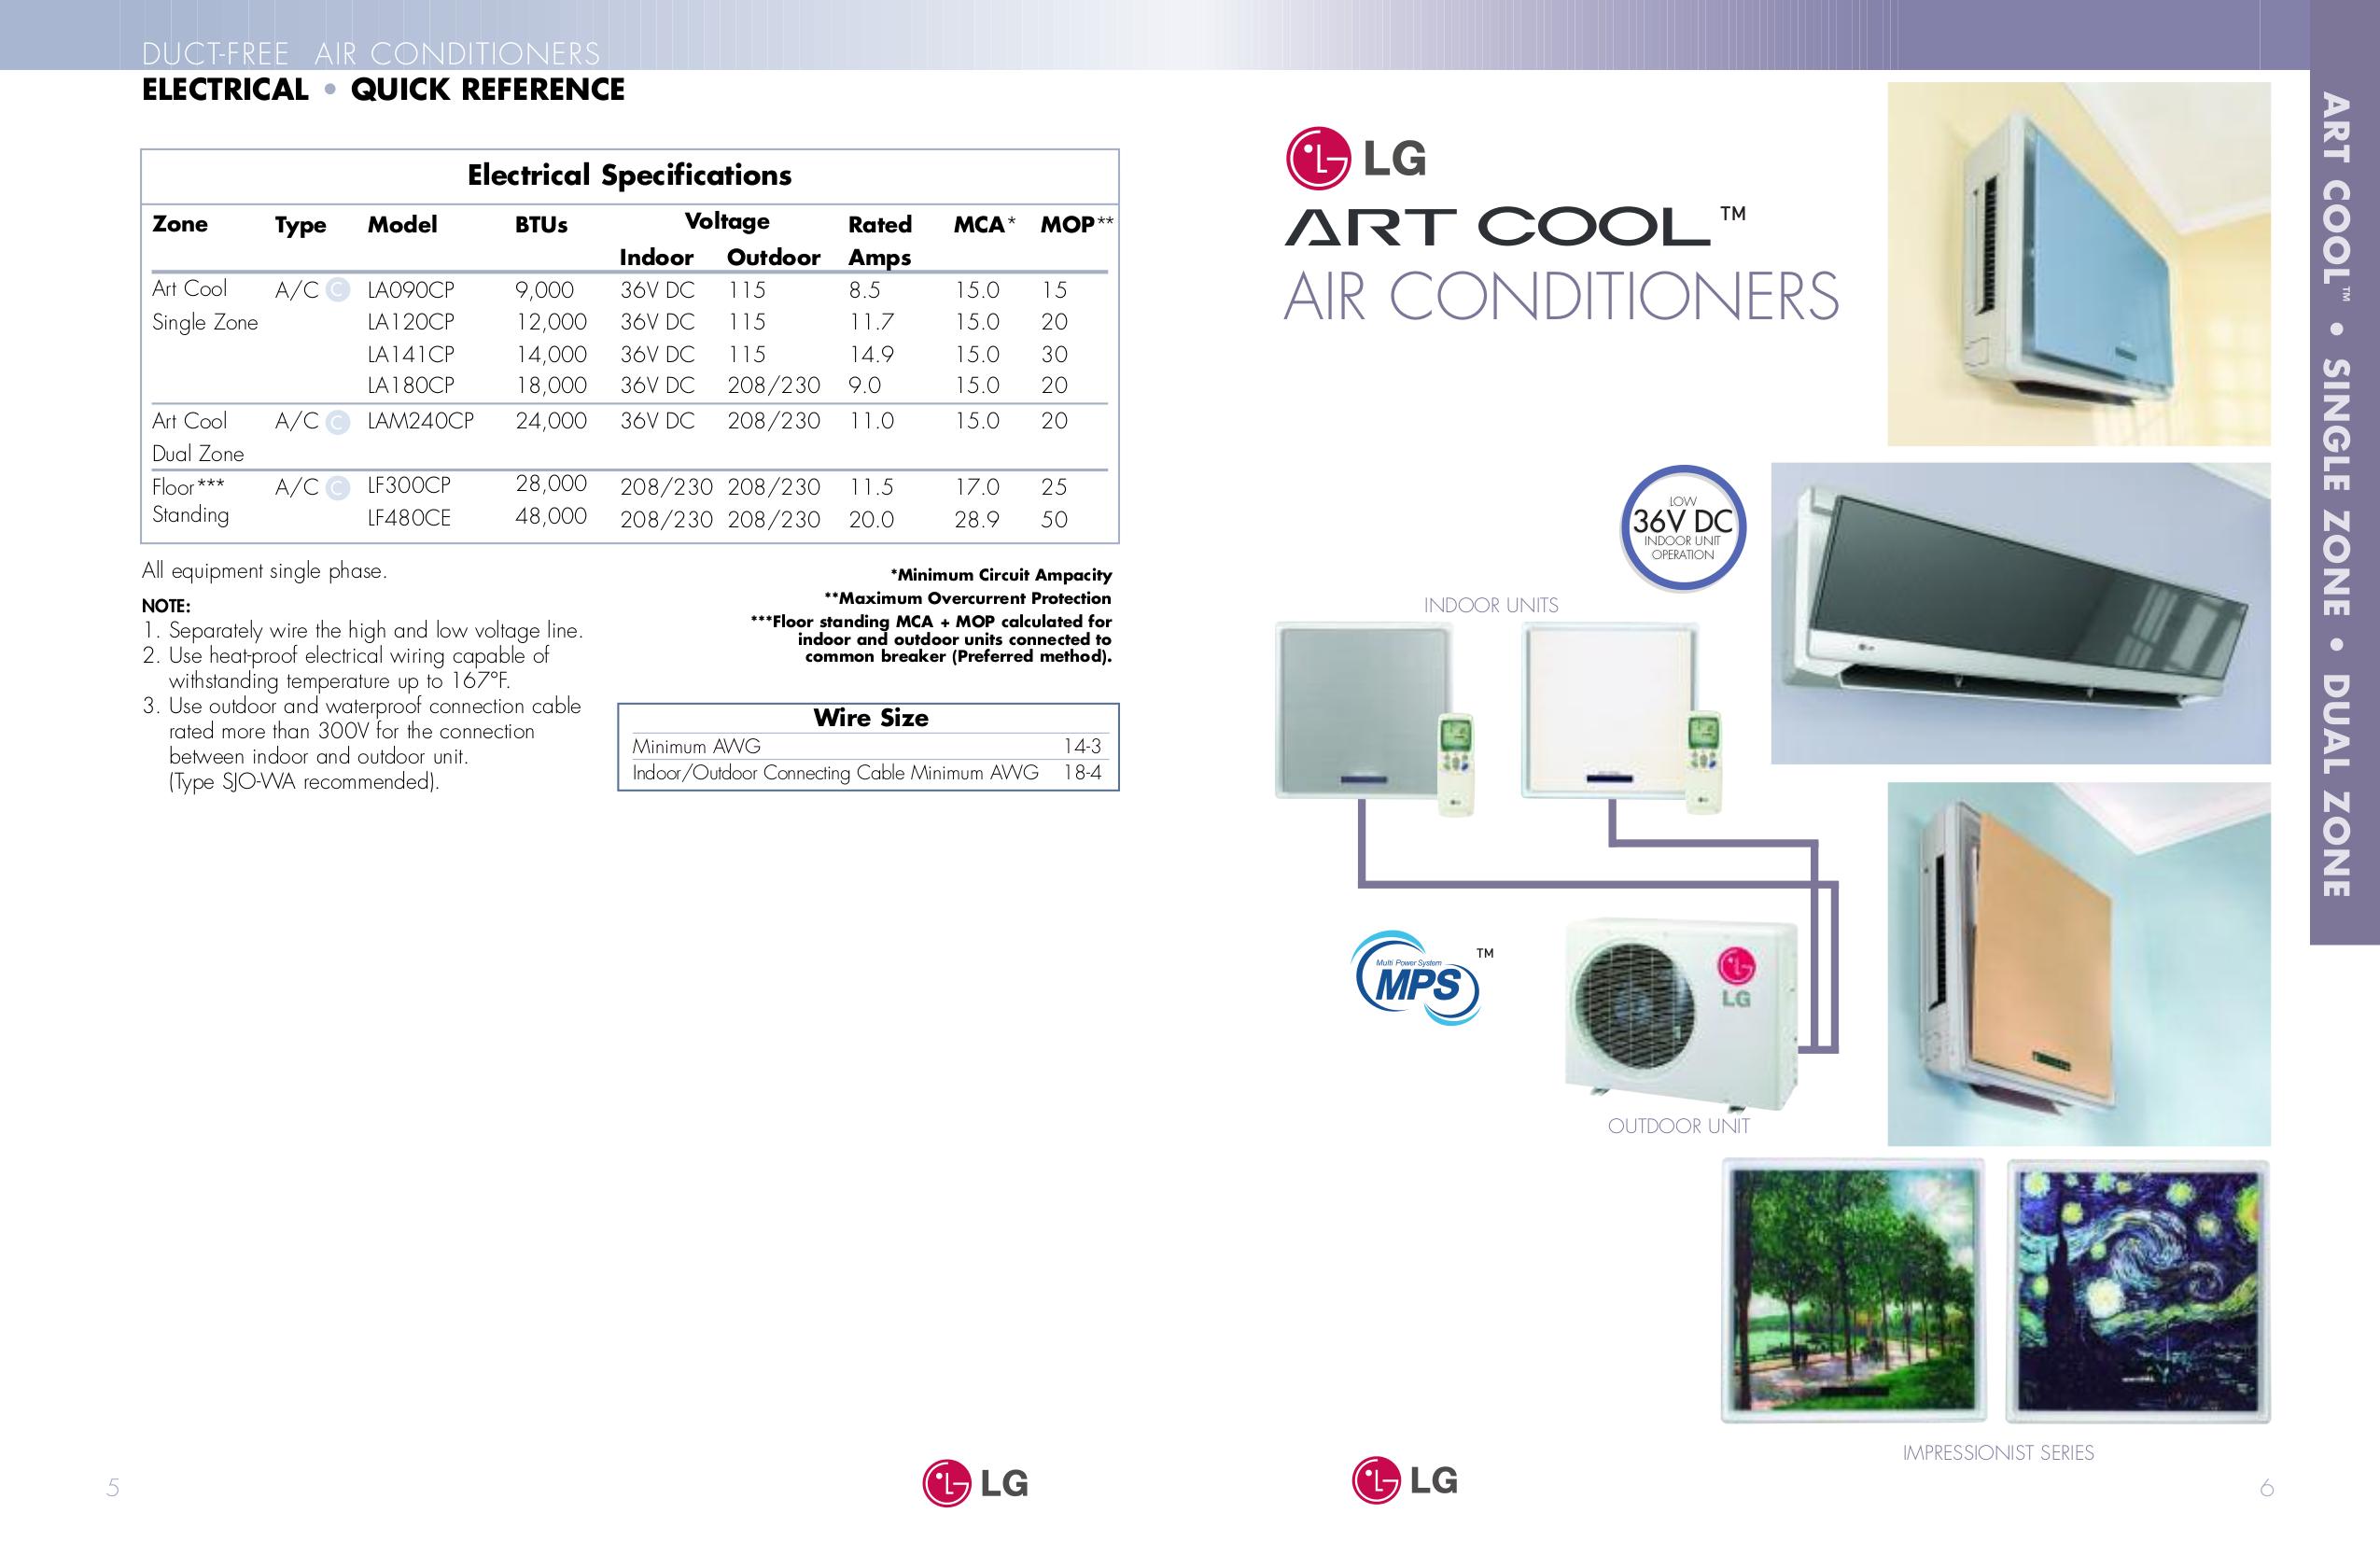 pdf manual for lg air conditioner art cool la120cp. Black Bedroom Furniture Sets. Home Design Ideas